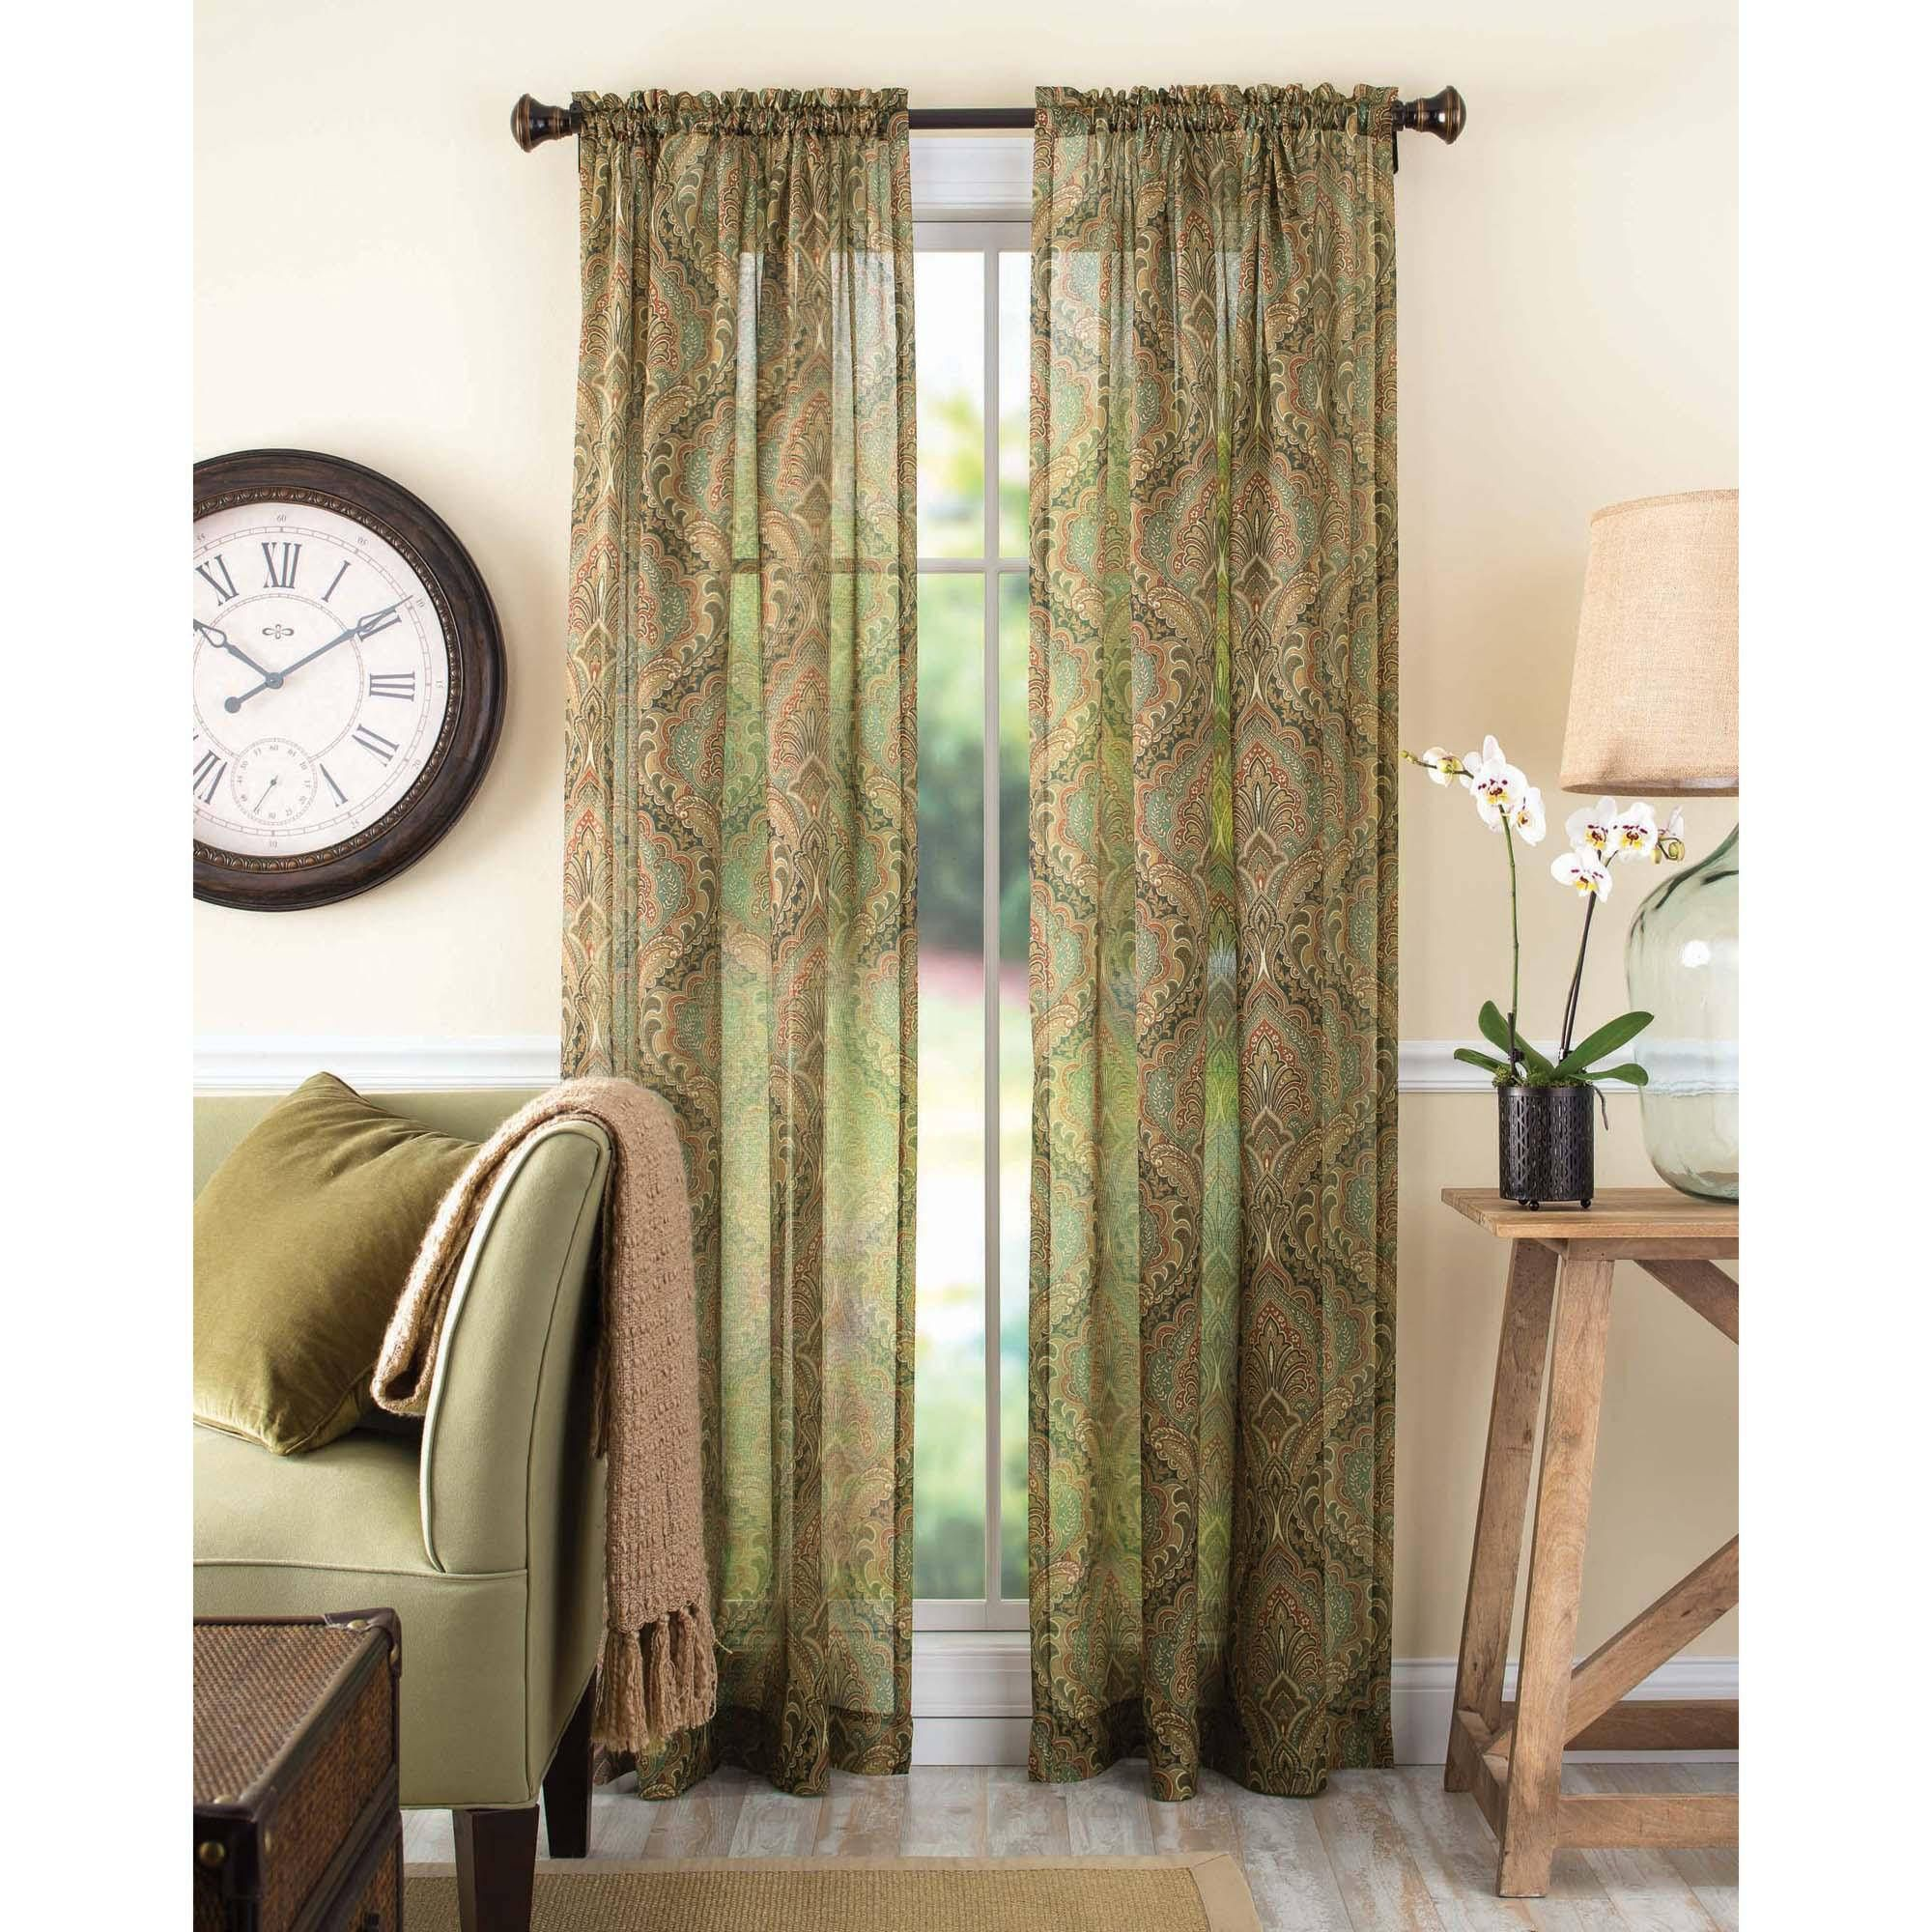 Captivating Charming Home Interior Accessories Ideas With Cute Walmart Curtain Panels: Walmart  Curtain | Gray Curtains